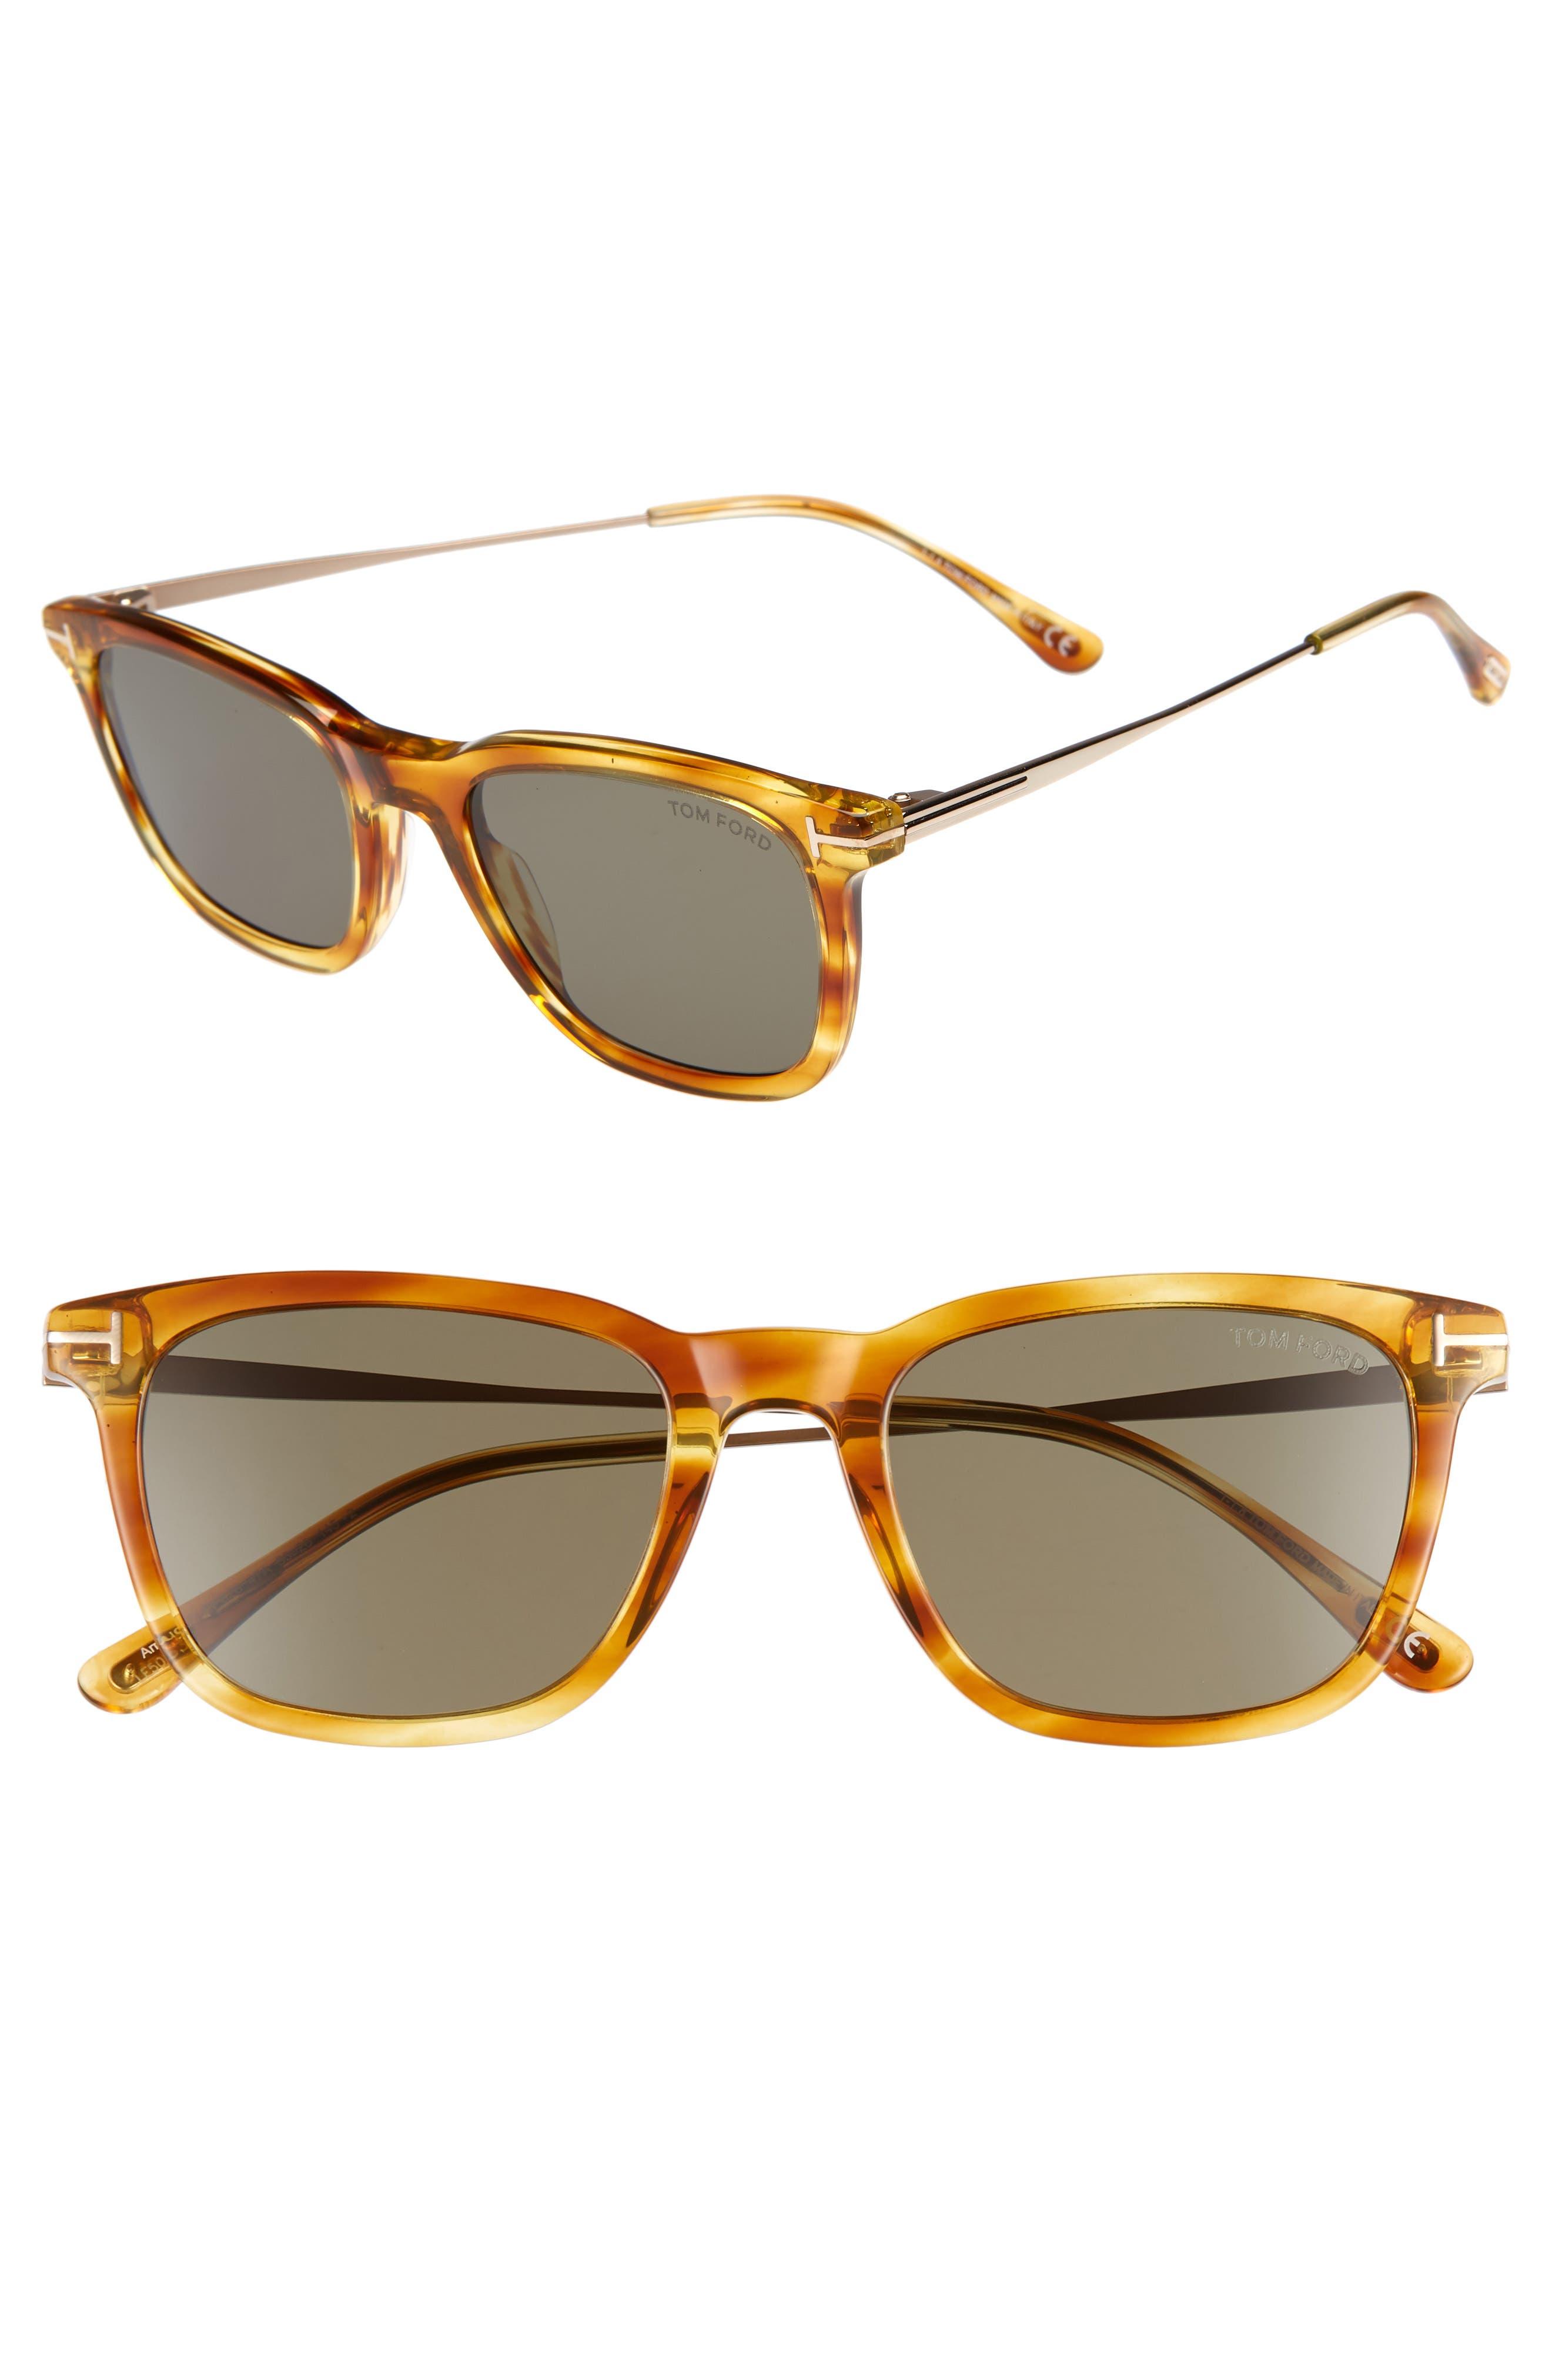 53mm Rectangle Sunglasses,                             Main thumbnail 1, color,                             LIGHT BROWN/ SMOKE